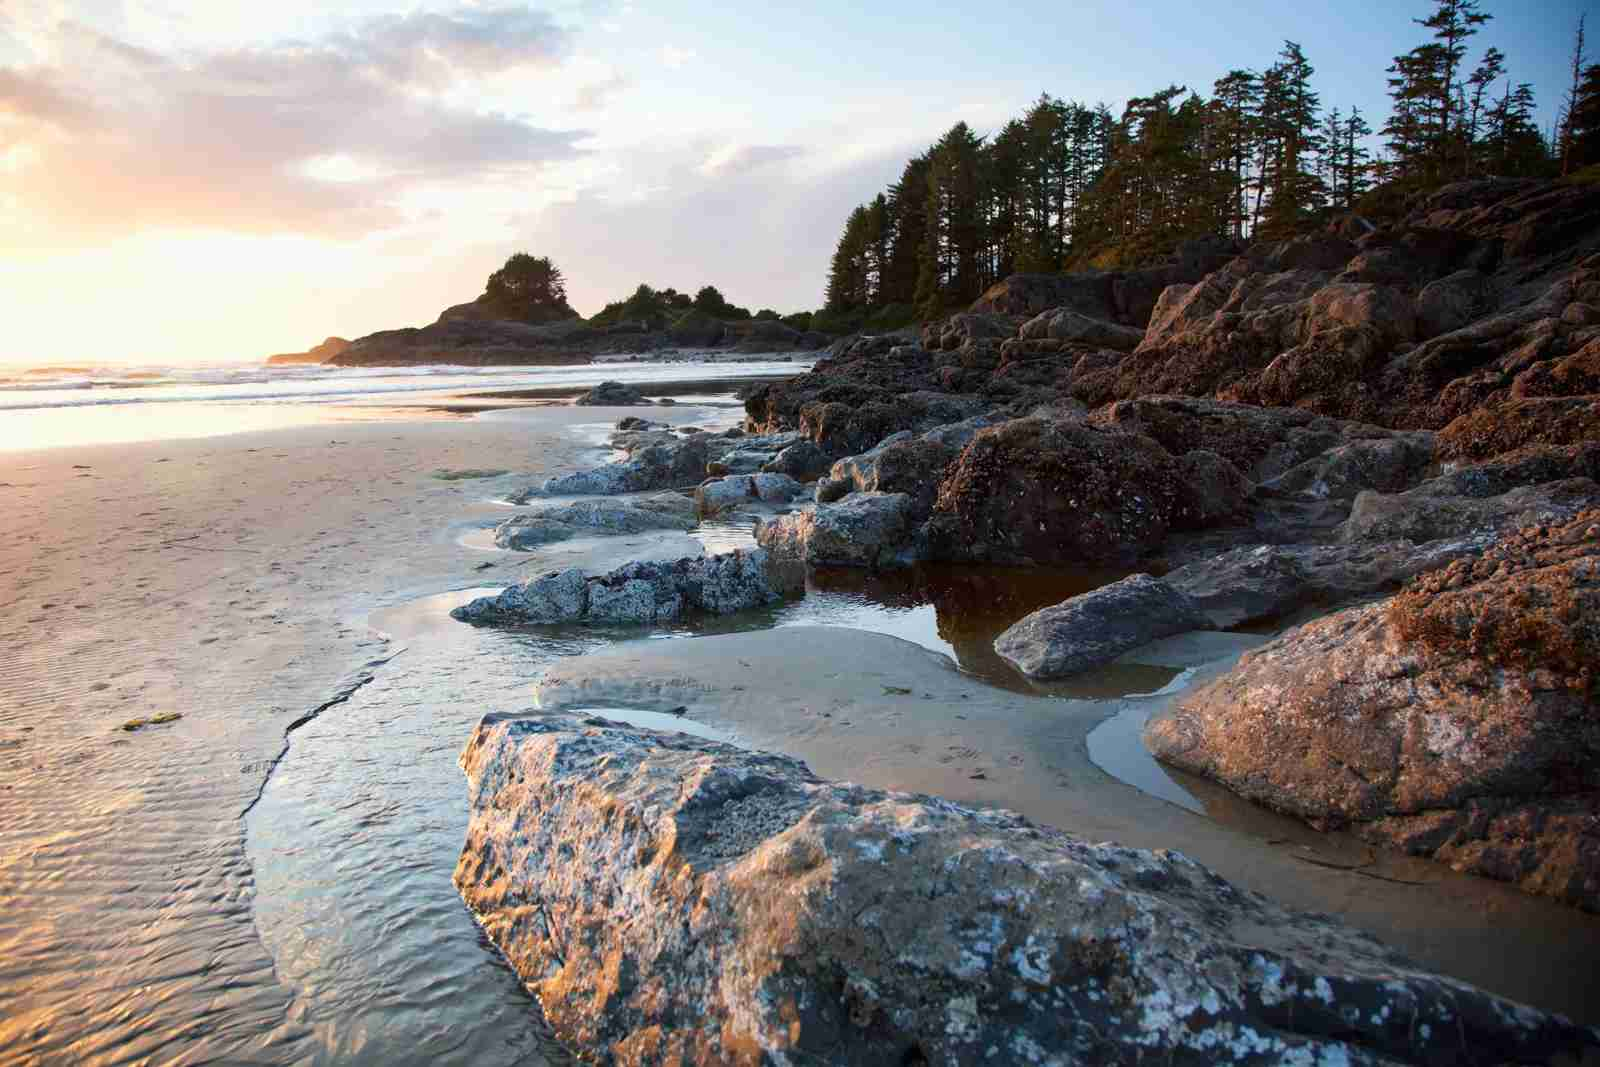 Cox Bay near Tofino. (Photo by DEDDEDA/Design Pics/Getty Images)